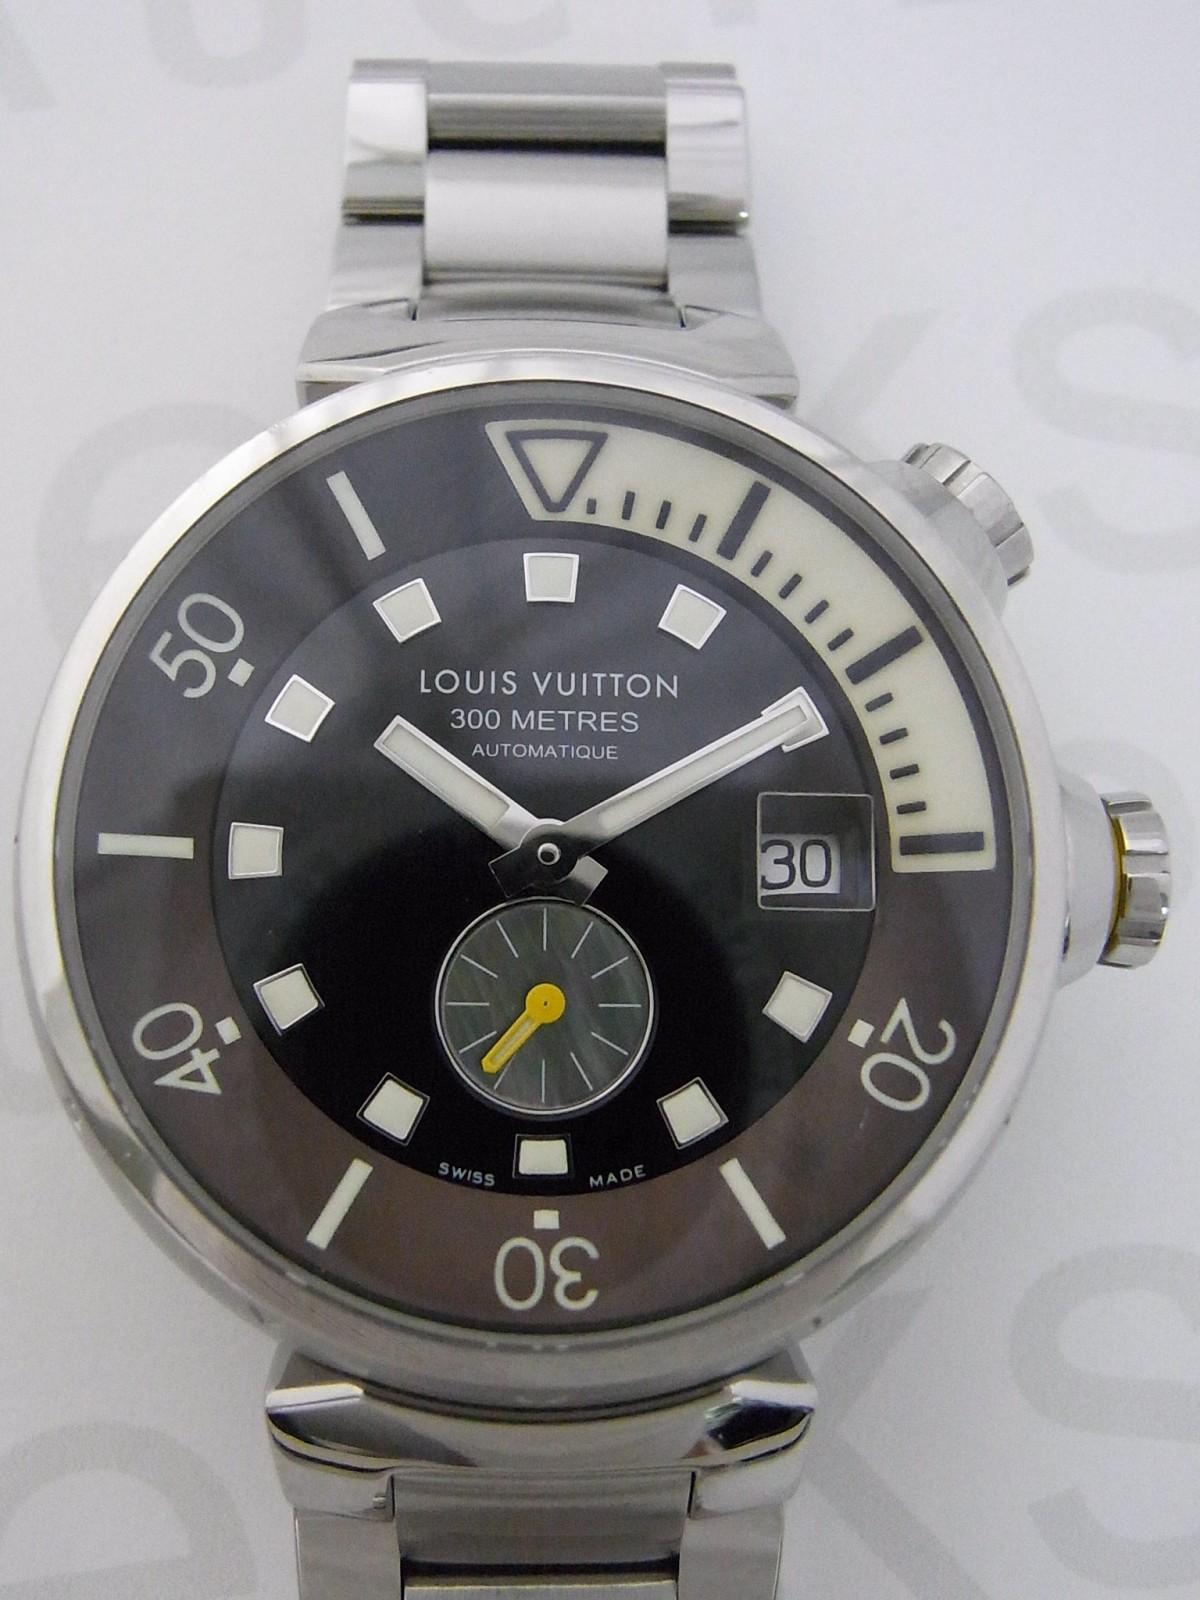 Montres Louis Vuitton tambour diving Q1031 d occasion (€453) - Timepeaks c8f0c2f6b15